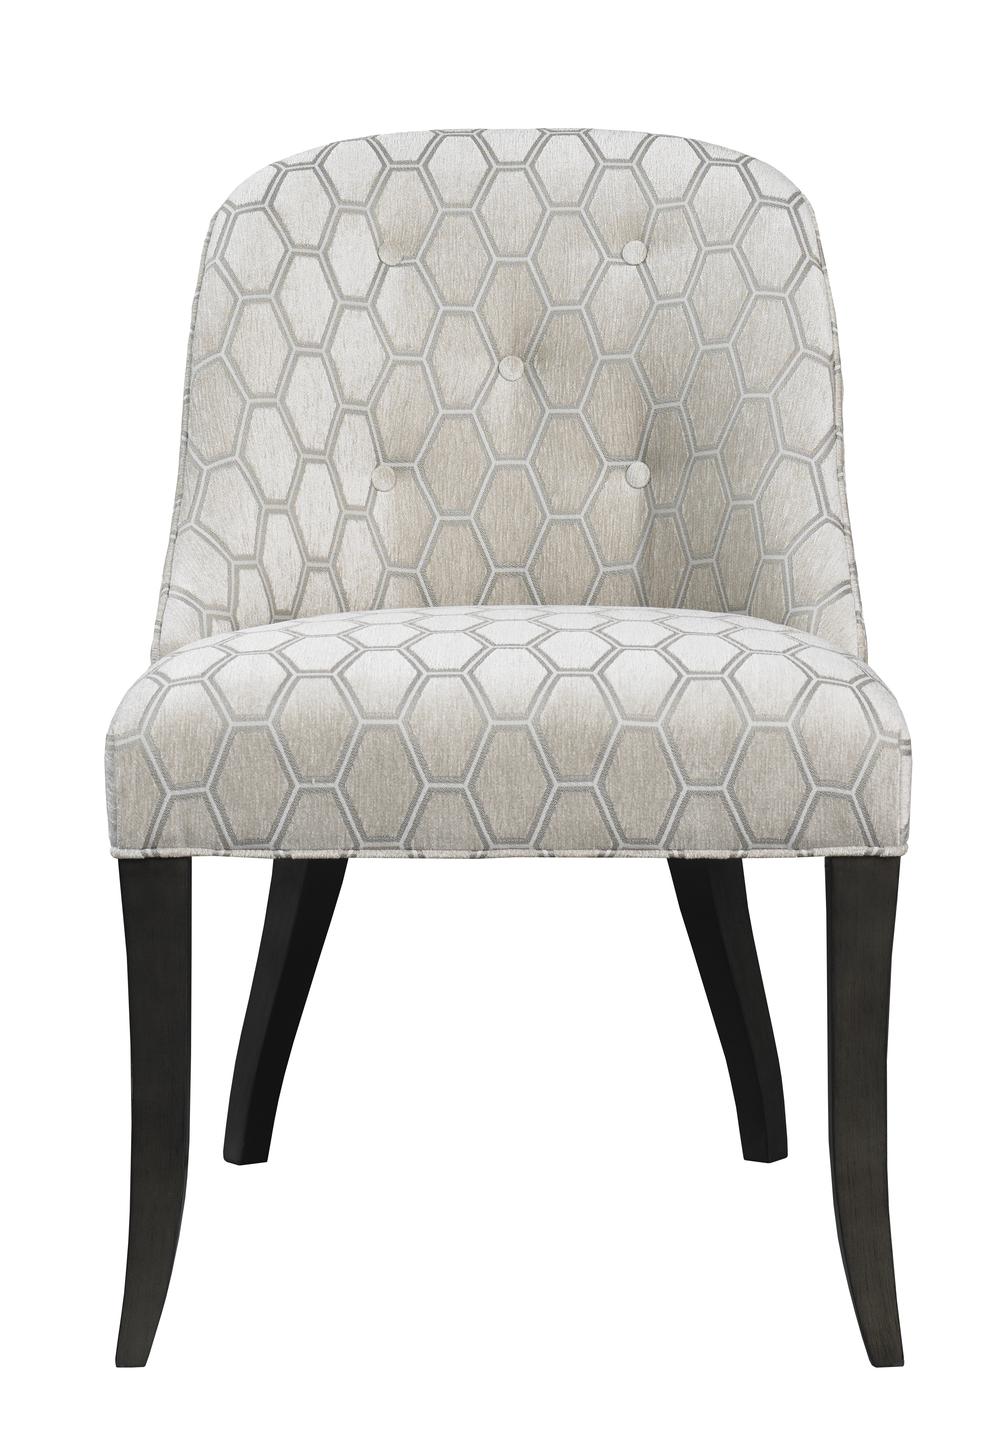 Lillian August Fine Furniture - Elson Armless Chair